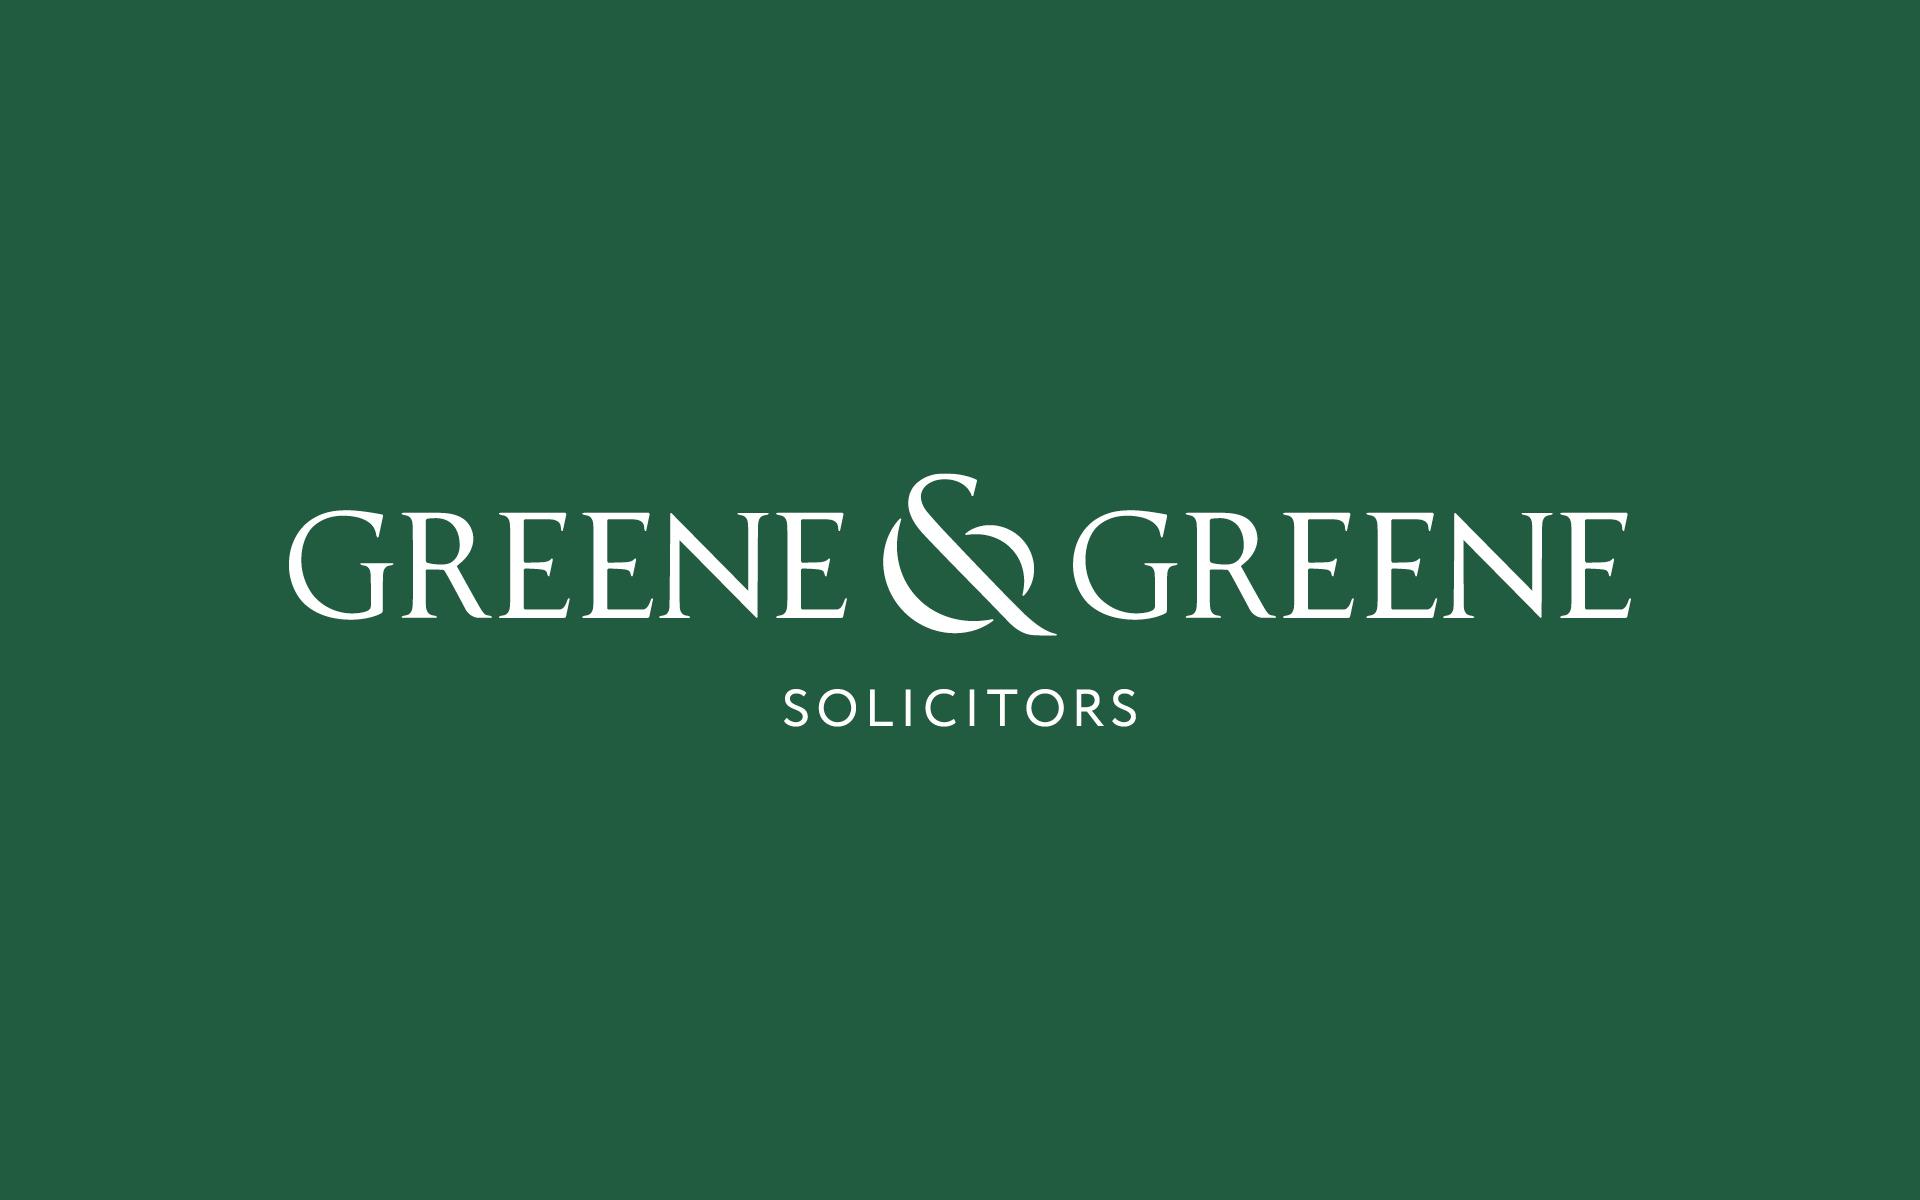 Greene & Greene landscape logo design